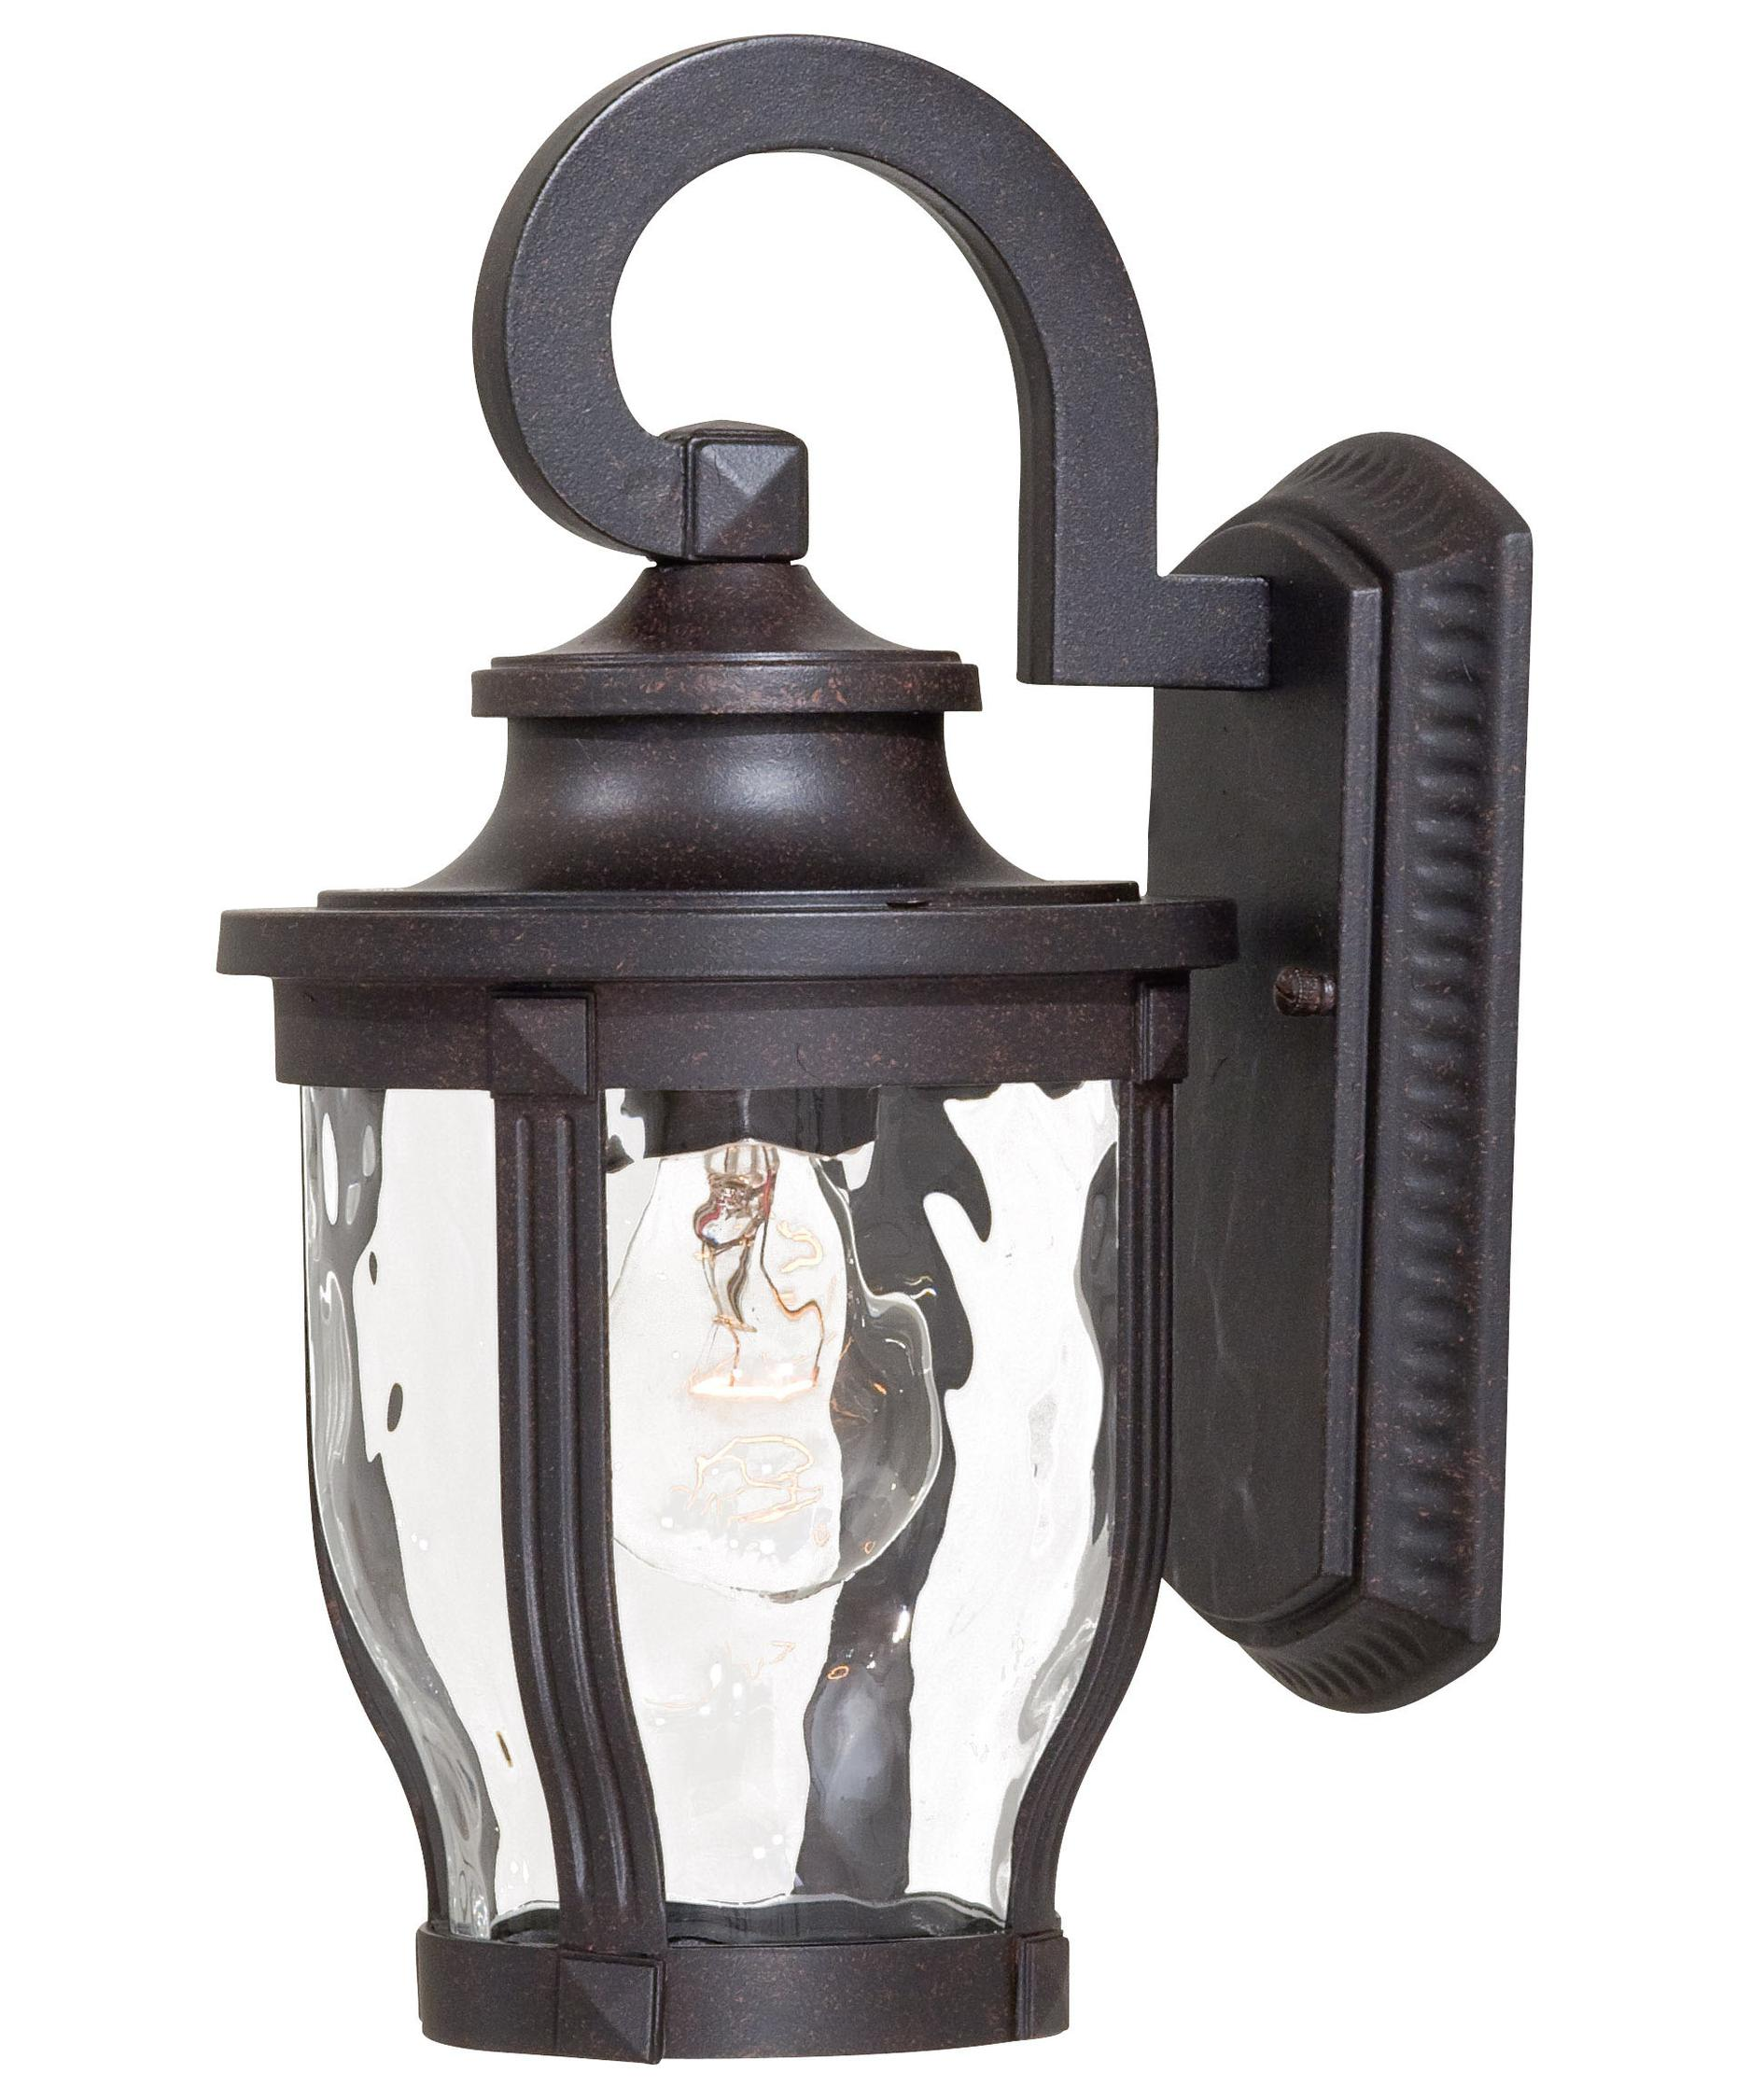 Minka Lavery 8761 Merrimack 6 Inch Wide 1 Light Outdoor Wall Light